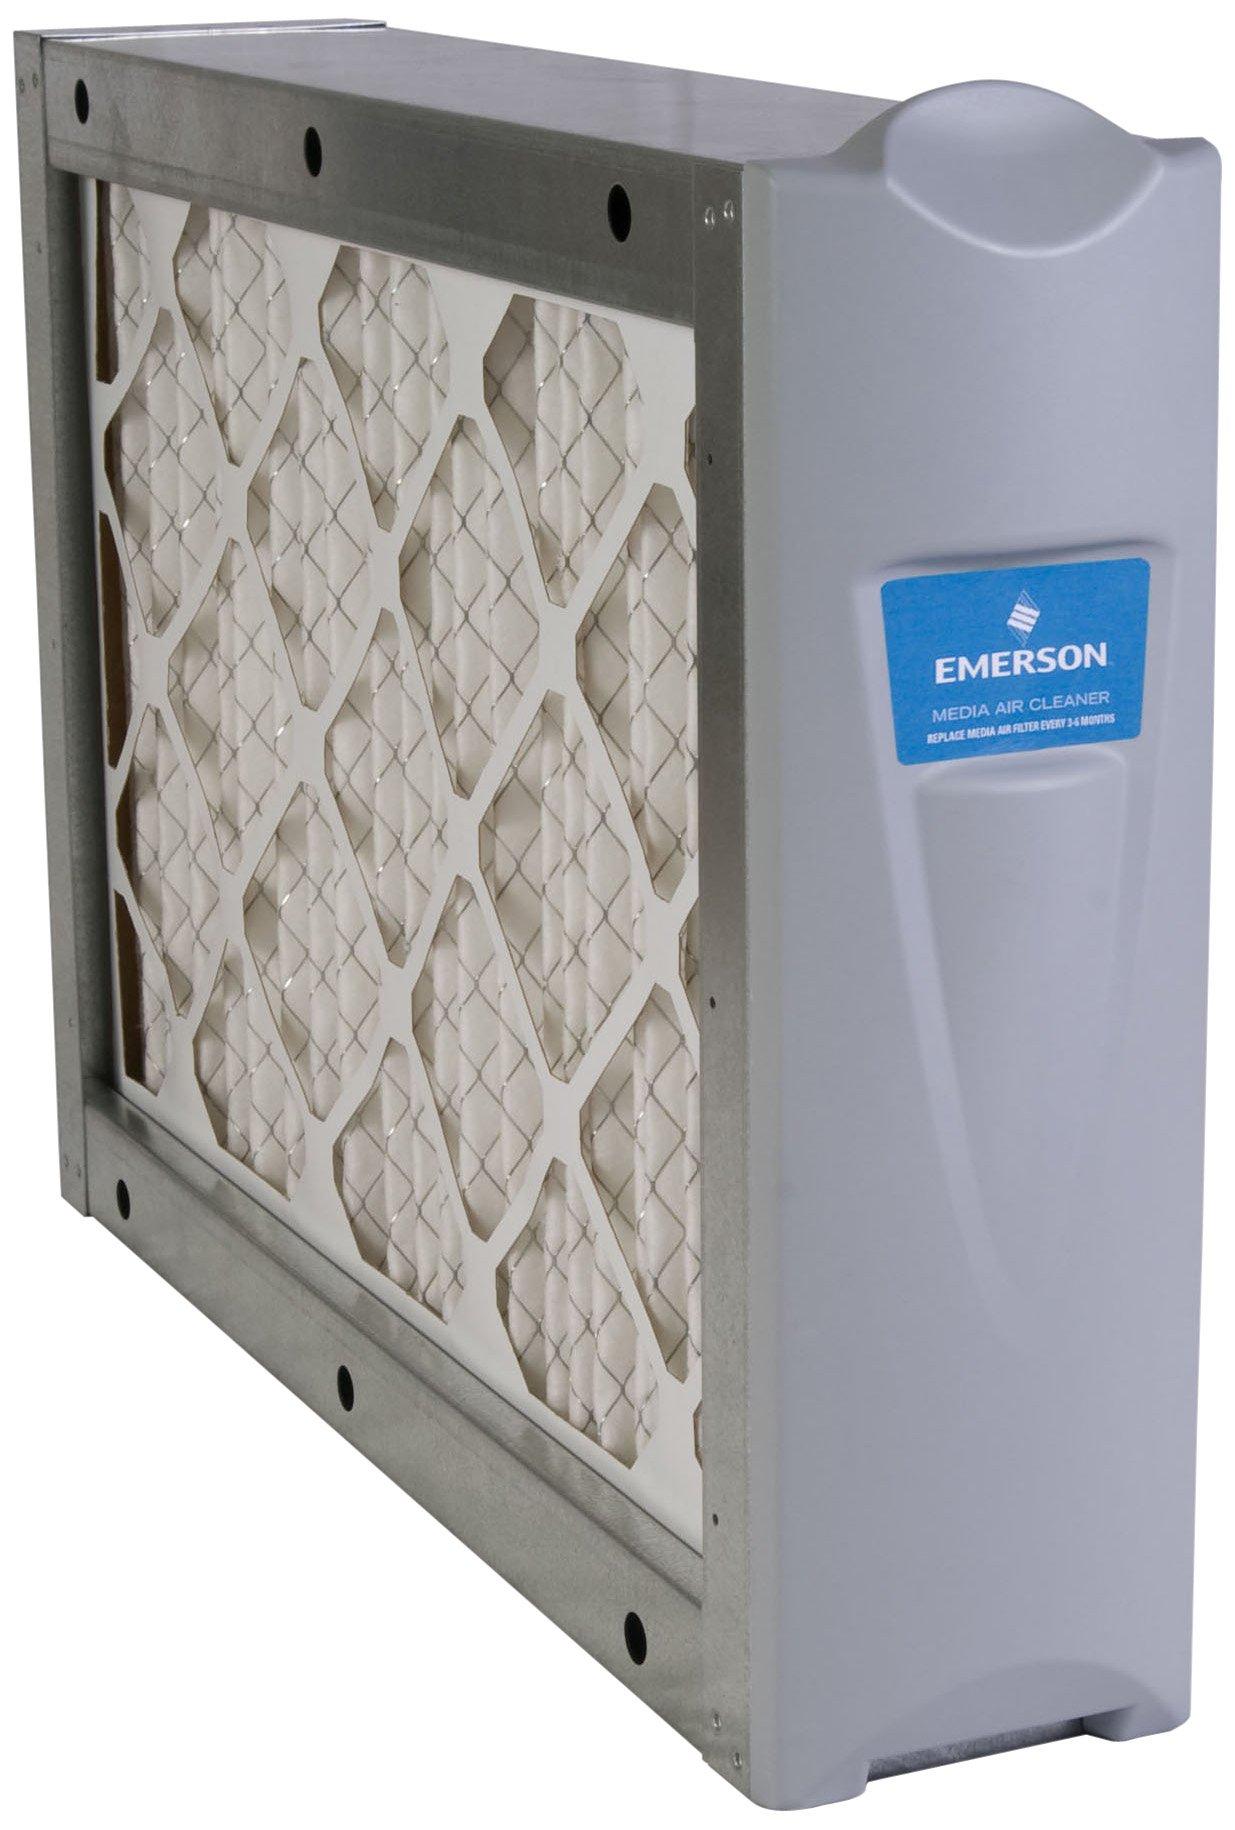 Emerson ACM1000M-108 Whole House Air Cleaner